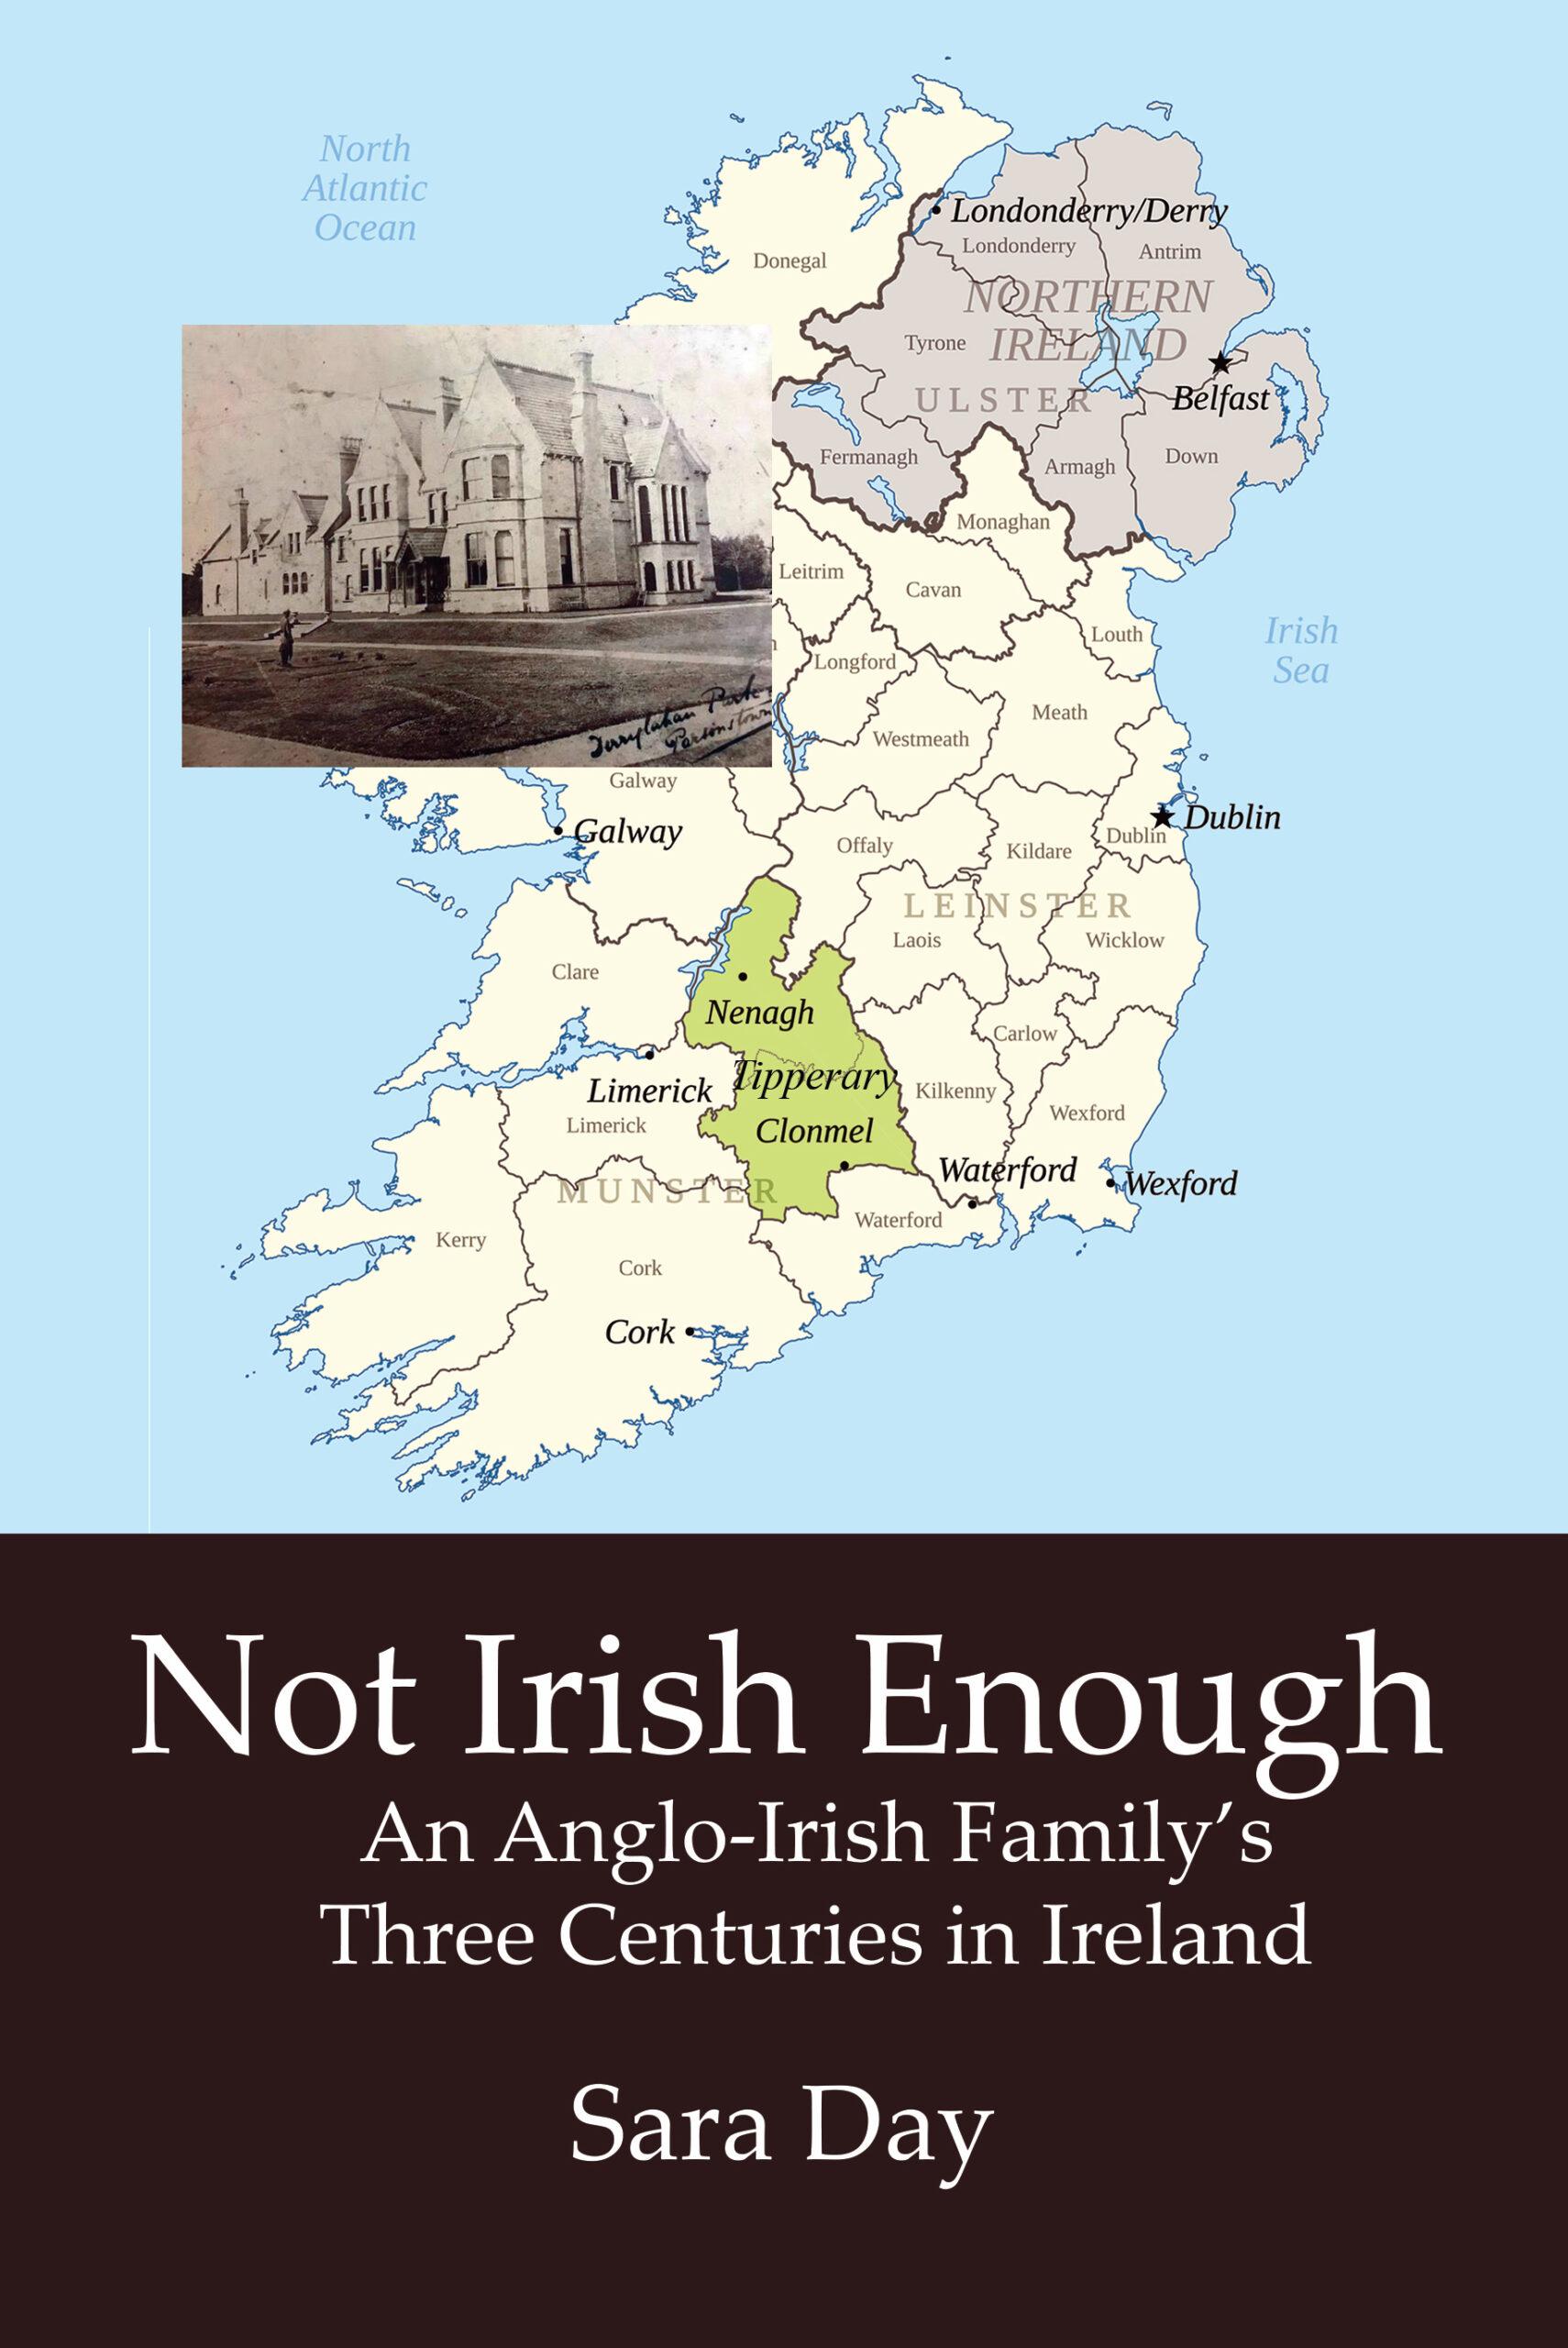 NOT IRISH ENOUGH: An Anglo-Irish Family's Three Centuries in Ireland